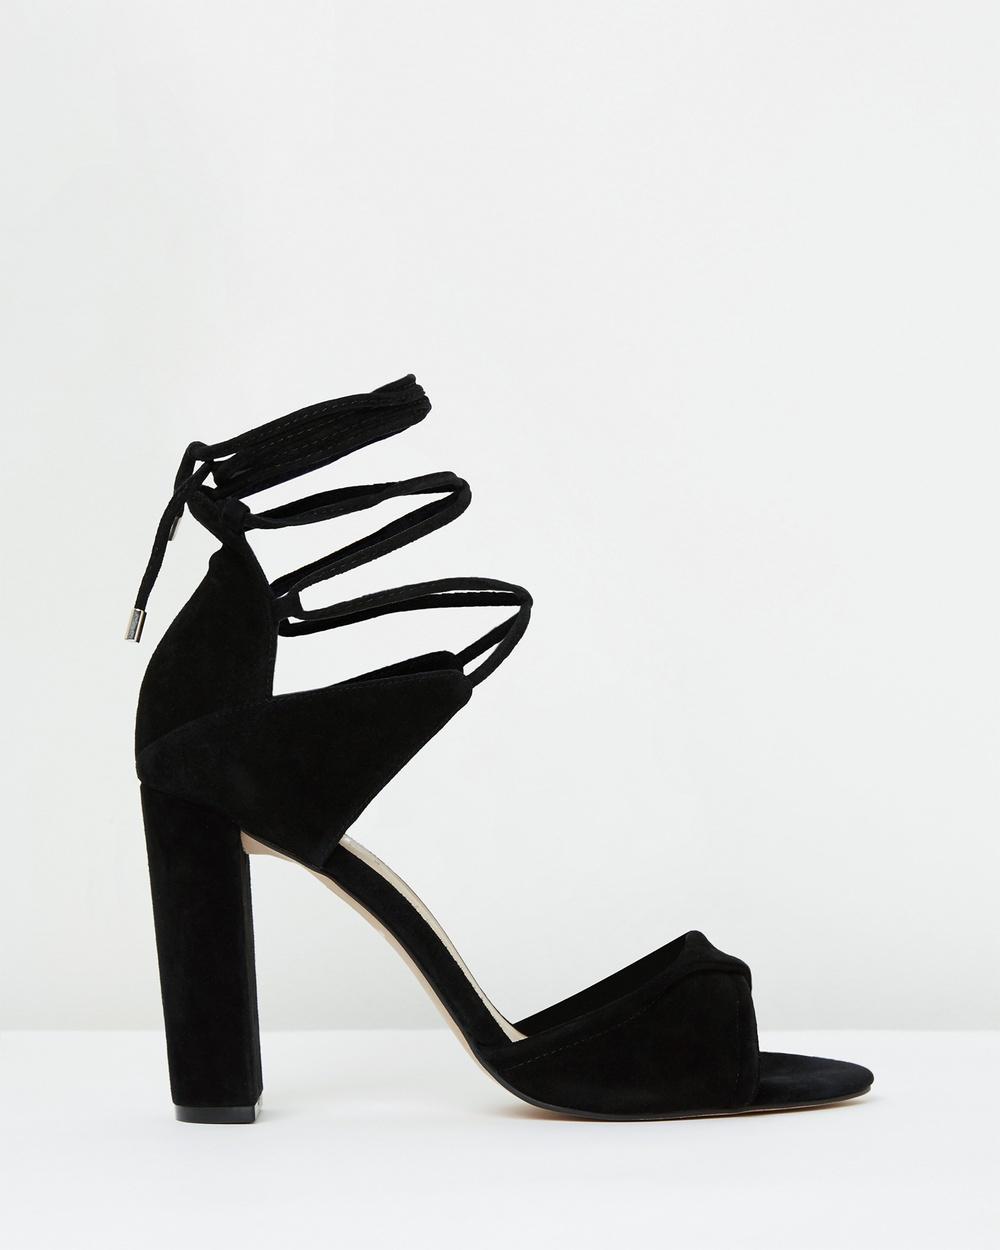 Mode Collective Origami Sandal Heels Black Suede Origami Sandal